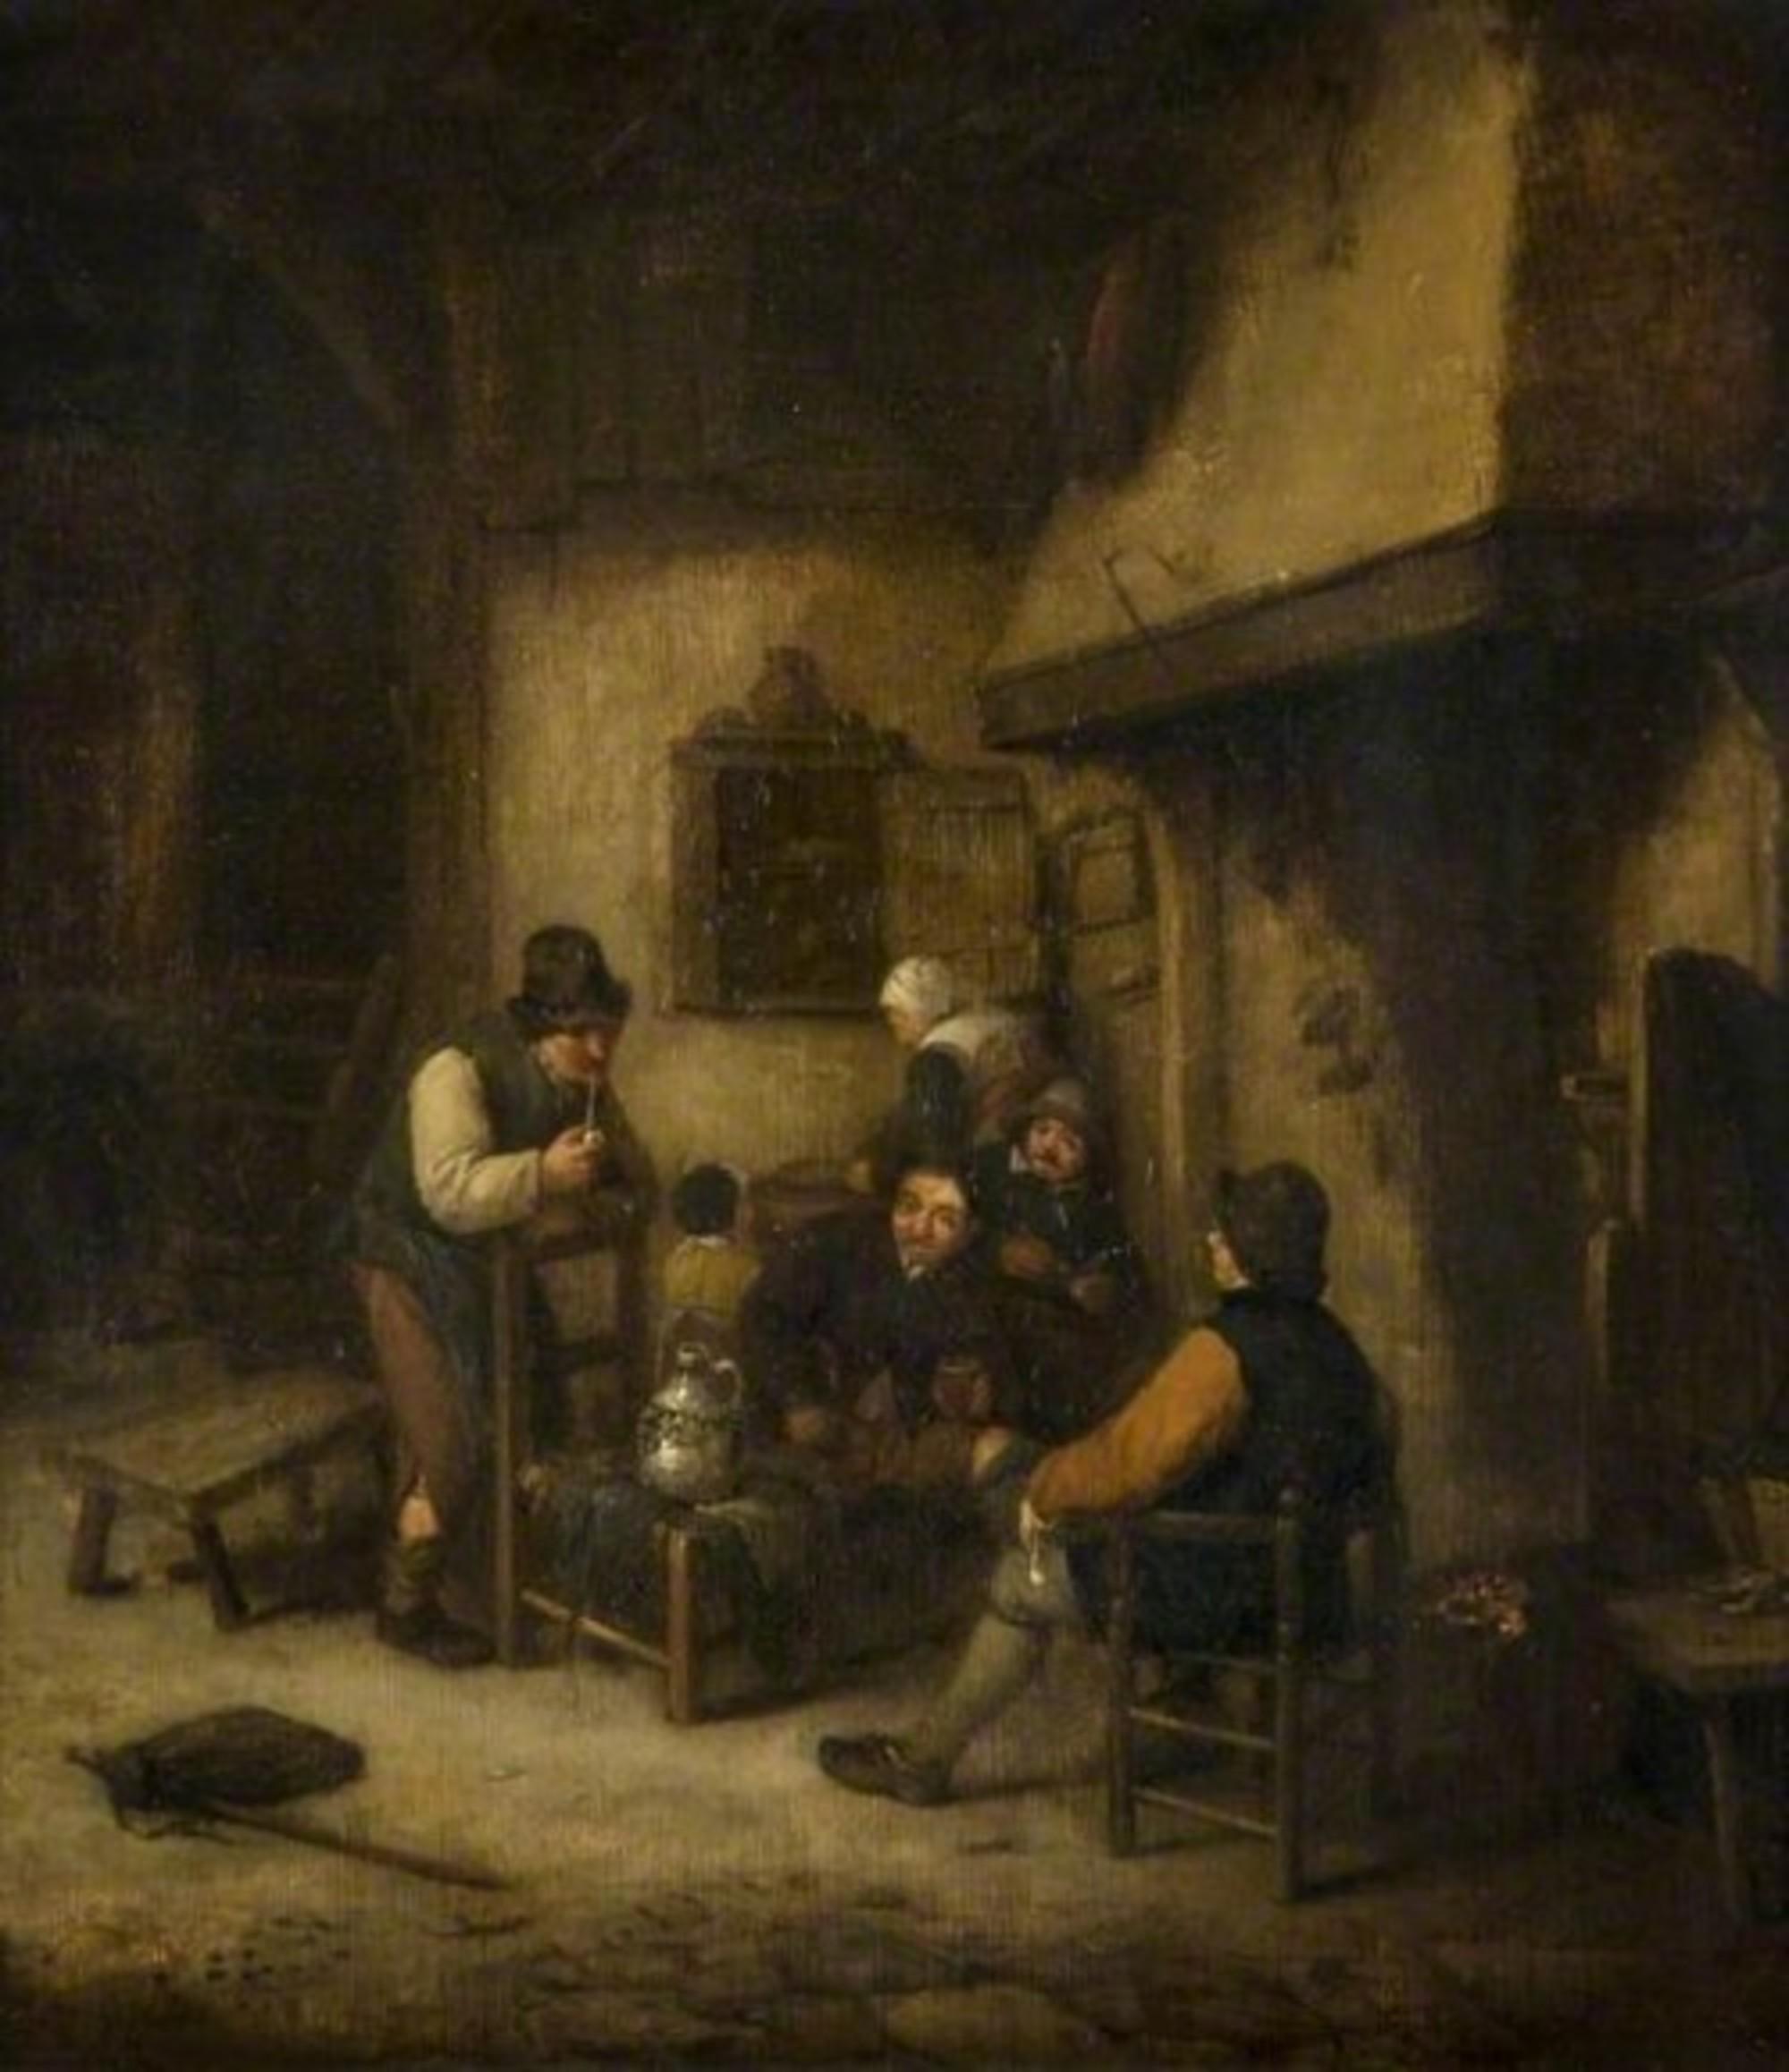 Adriaen-van-Ostade---Interior-with-Peasants-by-a-Fire-GL-GM-78.jpg